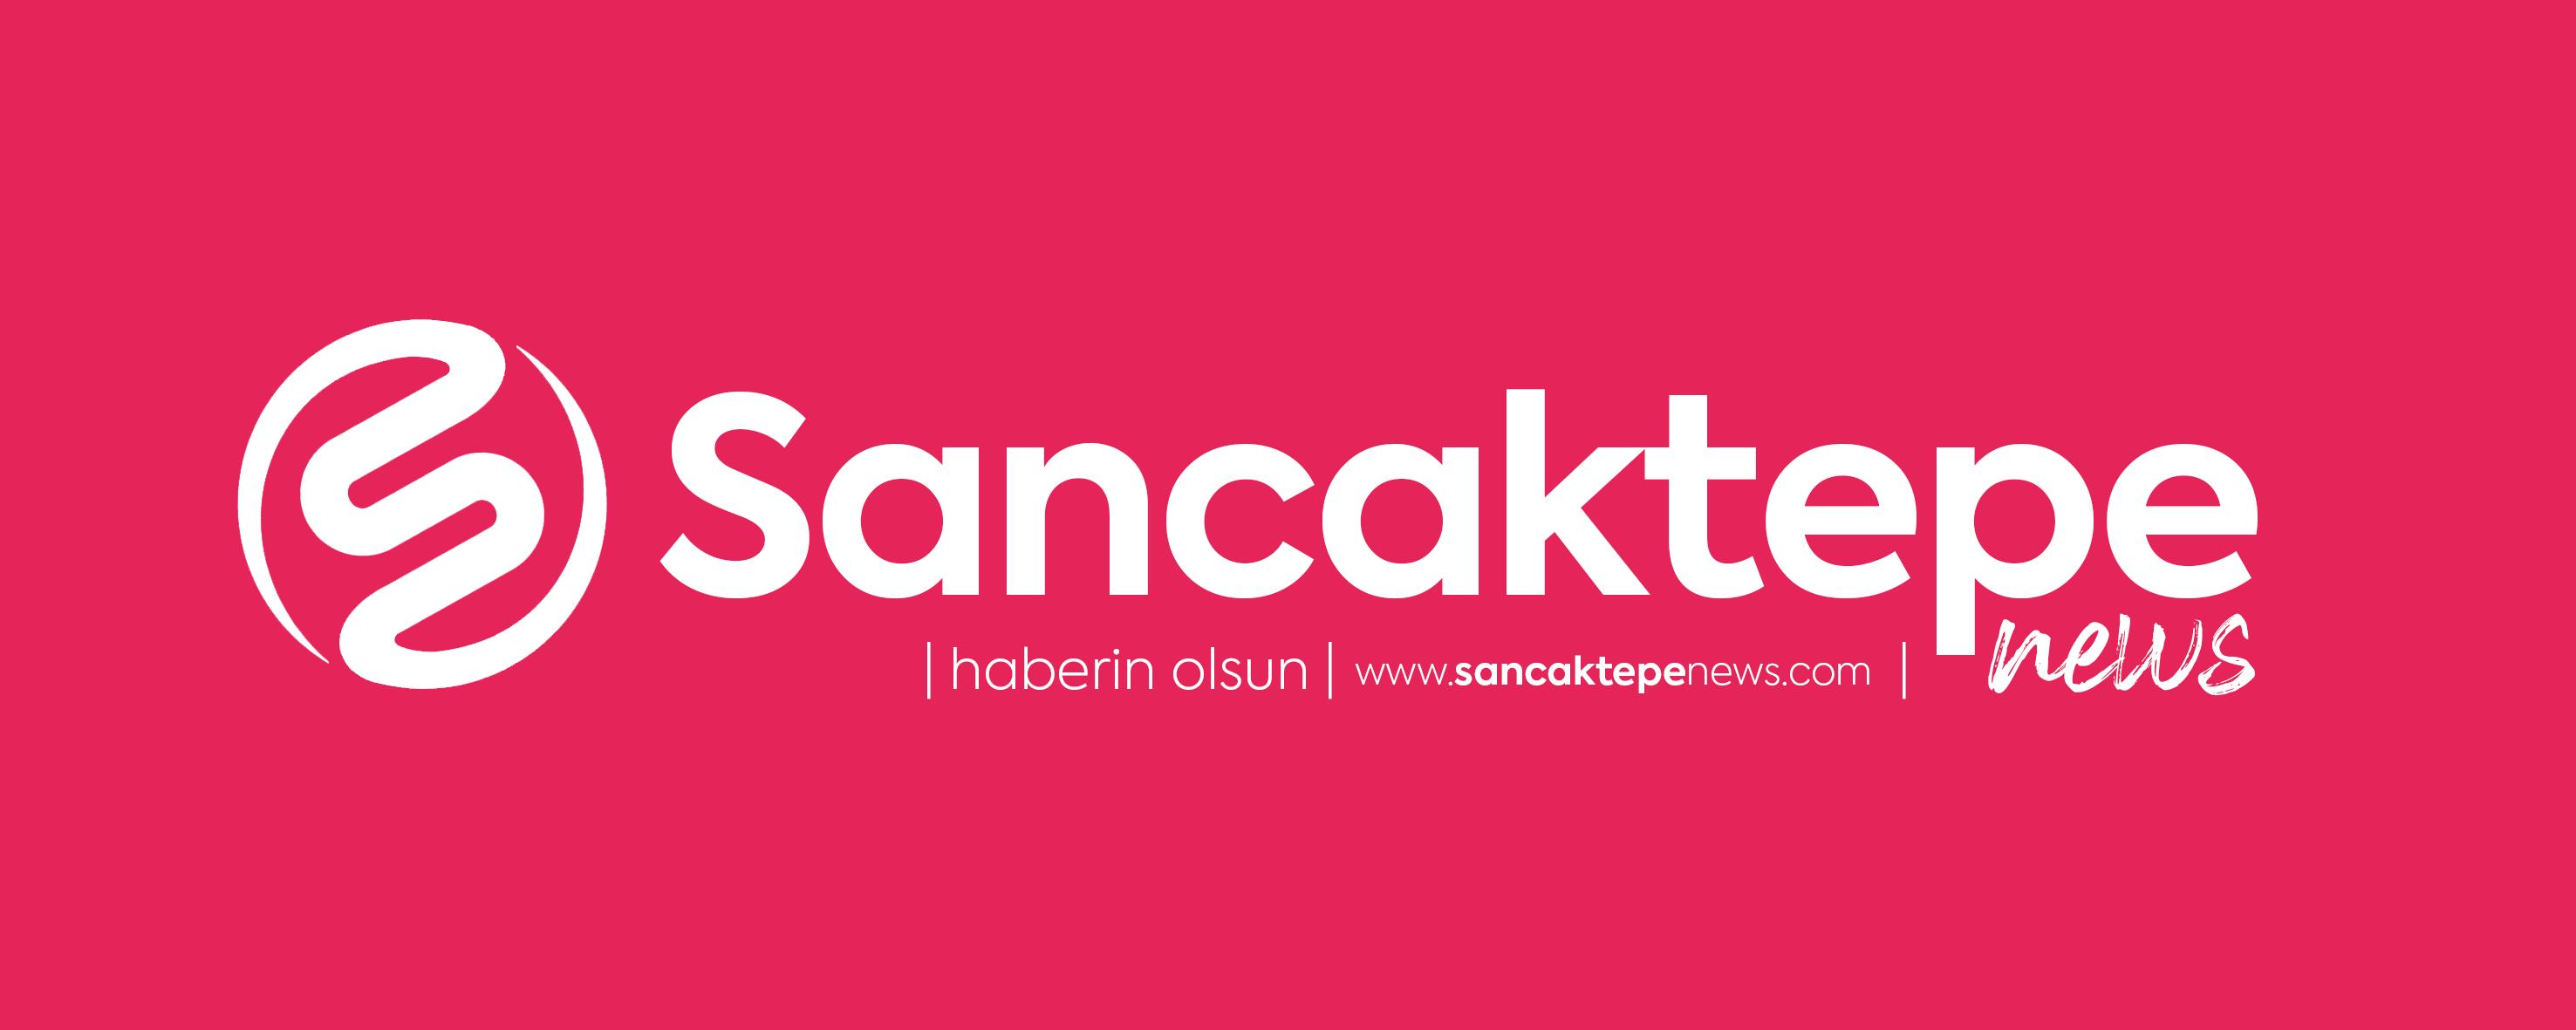 Sancaktepe News